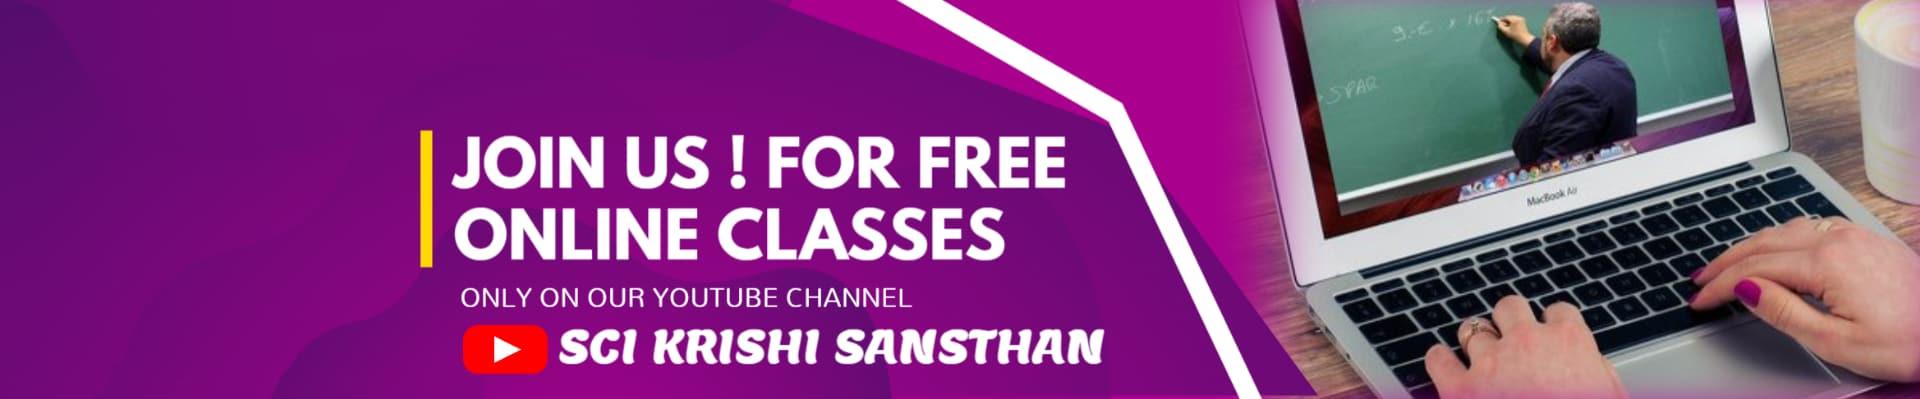 SCI Krishi Sansthan - Coaching Classes Center in Gwalior